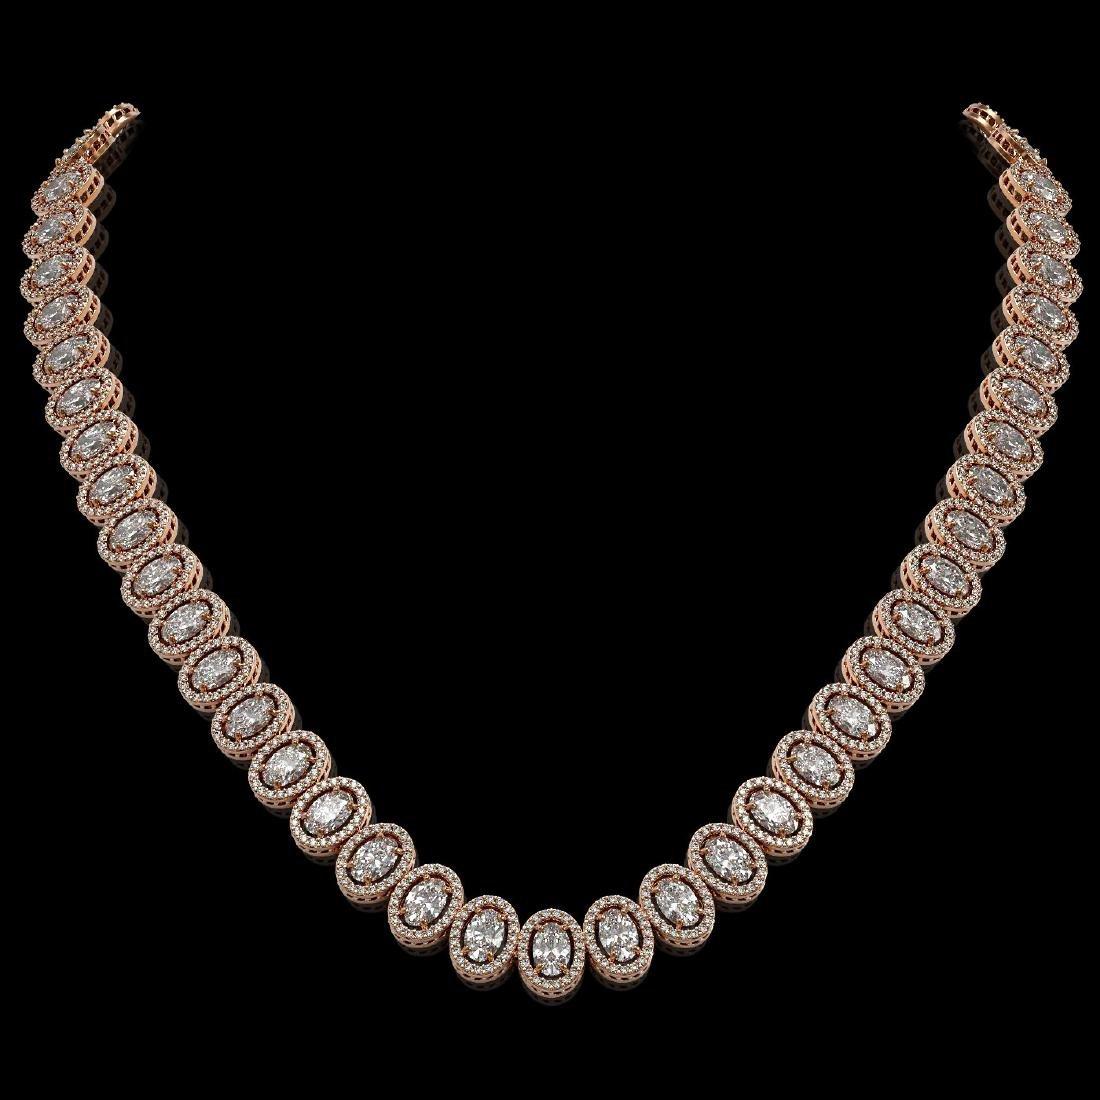 34.72 CTW Oval Diamond Designer Necklace 18K Rose Gold